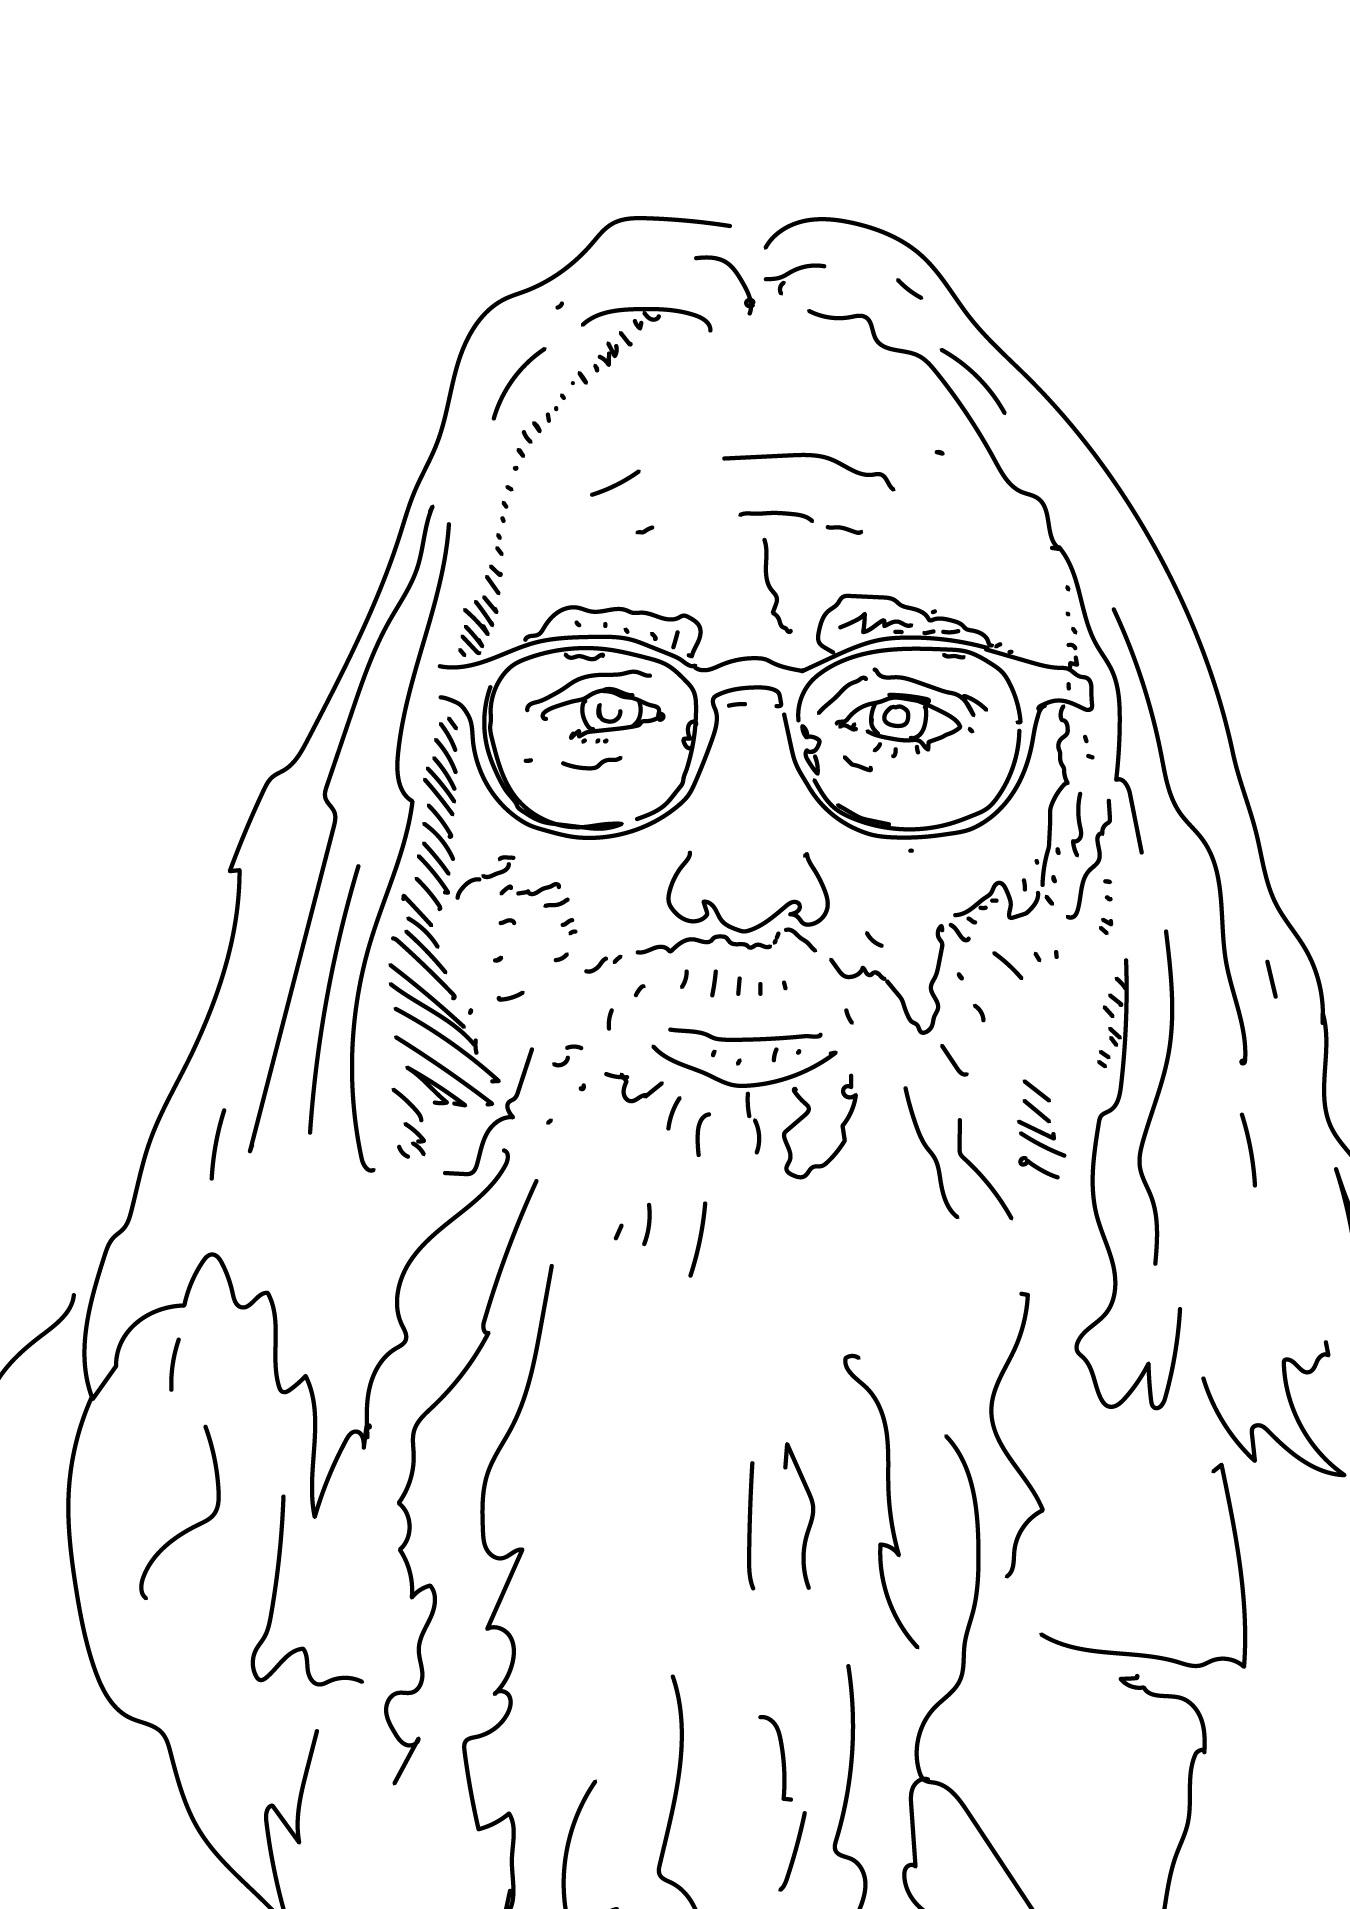 Illustration of Koen Berghmans